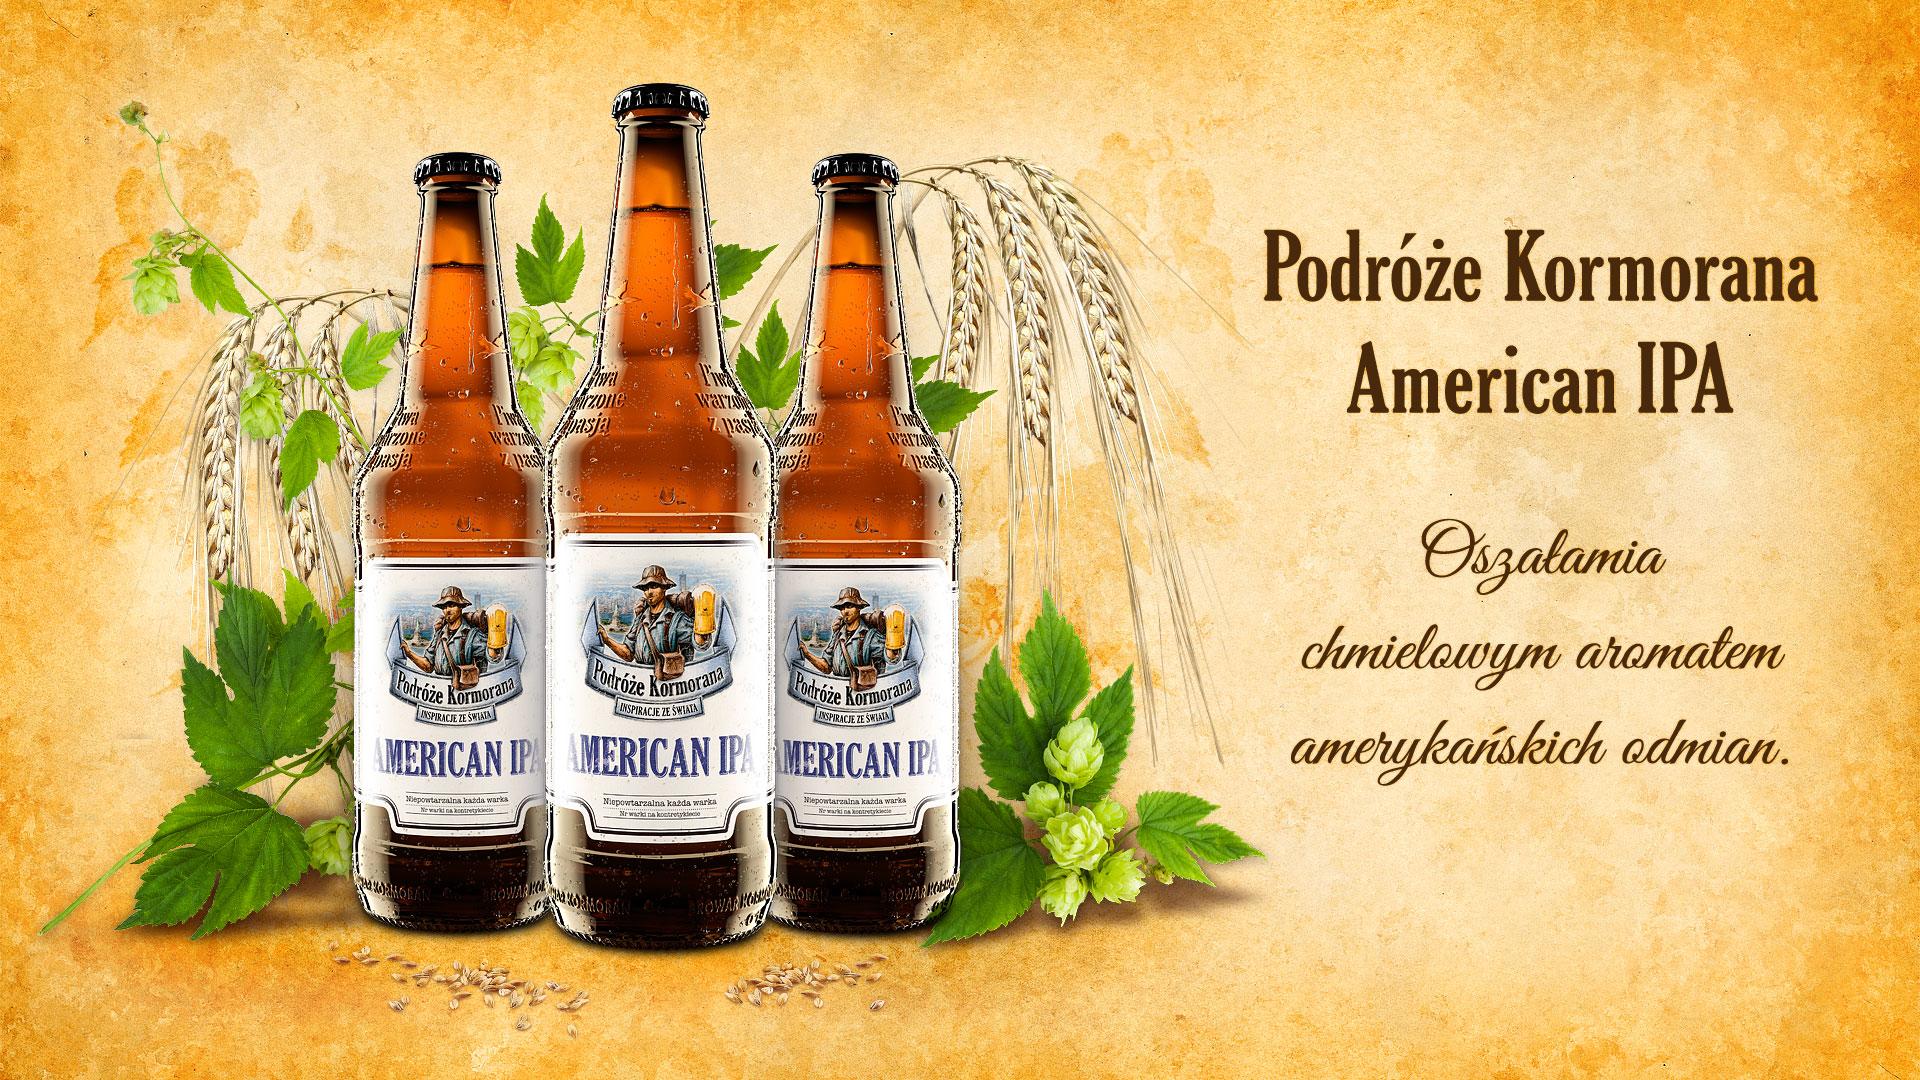 Piwo Podróże Kormorana American IPA - Browar Kormoran